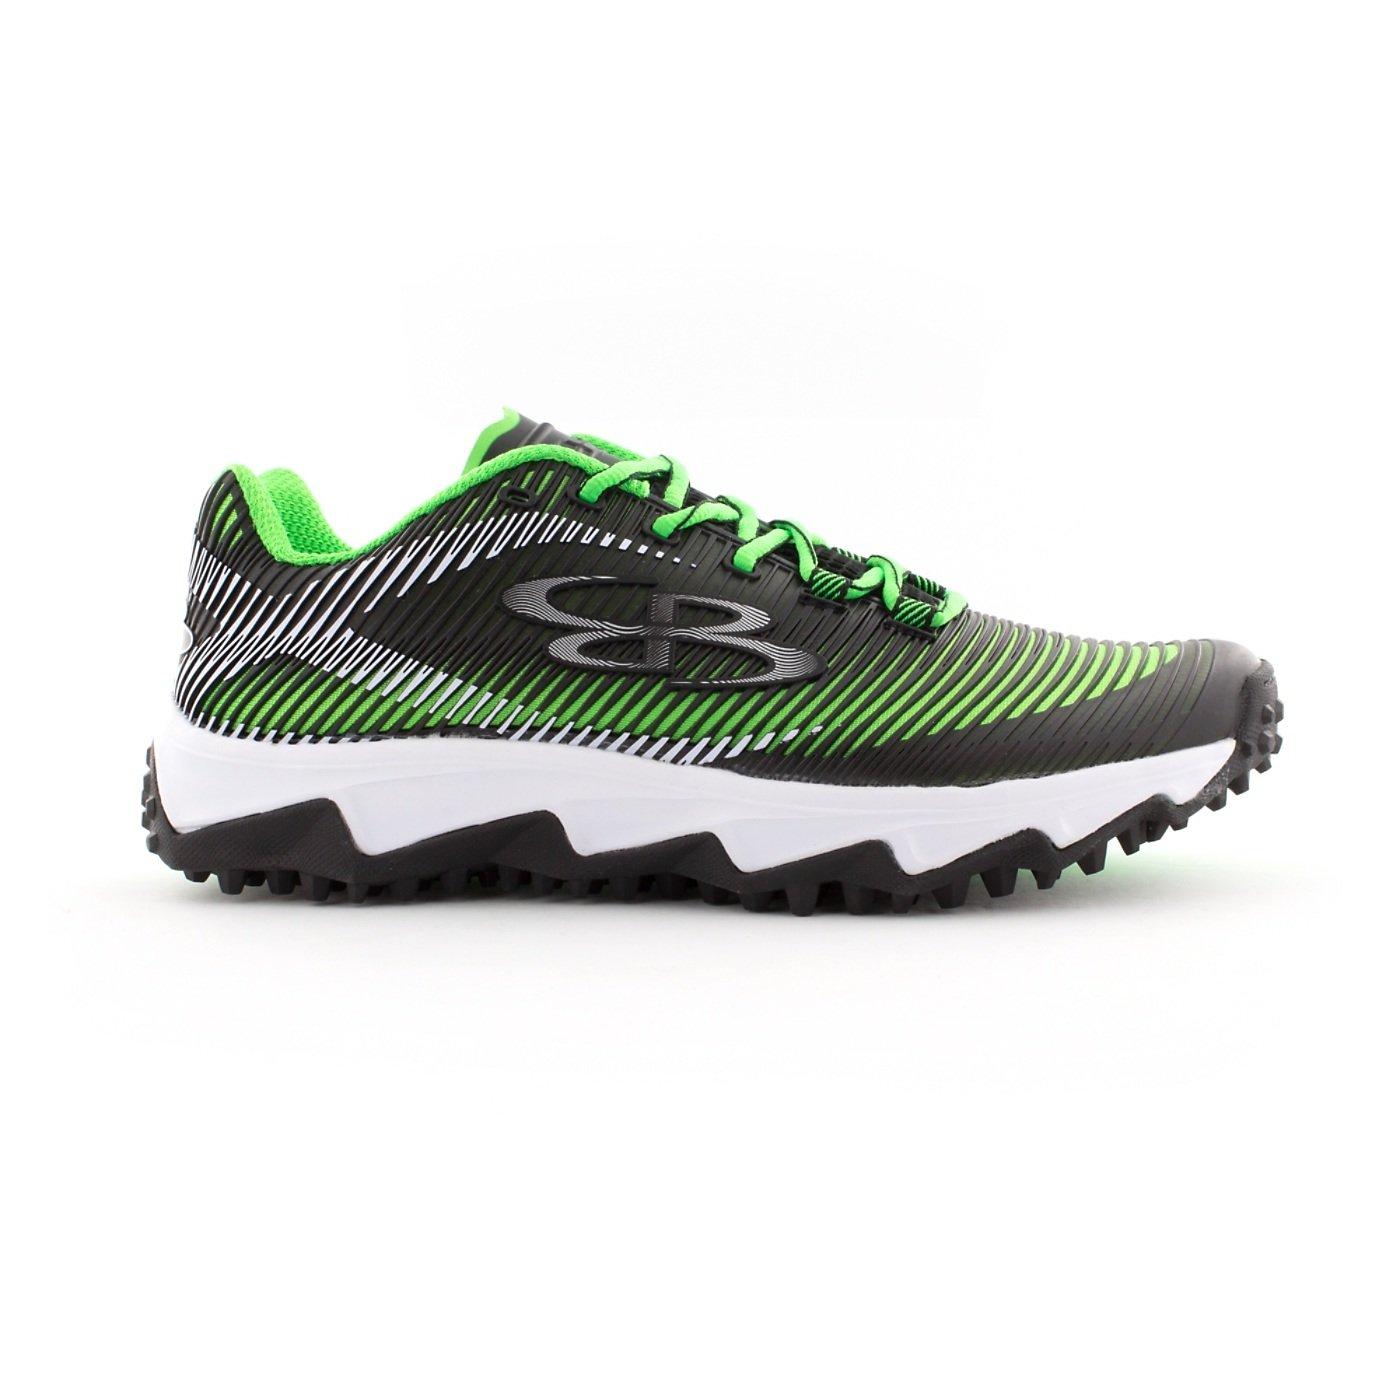 BoombahメンズAftershock DPS Turf Shoes – 18カラーオプション – 複数のサイズÉ B0767PZC5V 11.5|ブラック/ライムグリーン ブラック/ライムグリーン 11.5